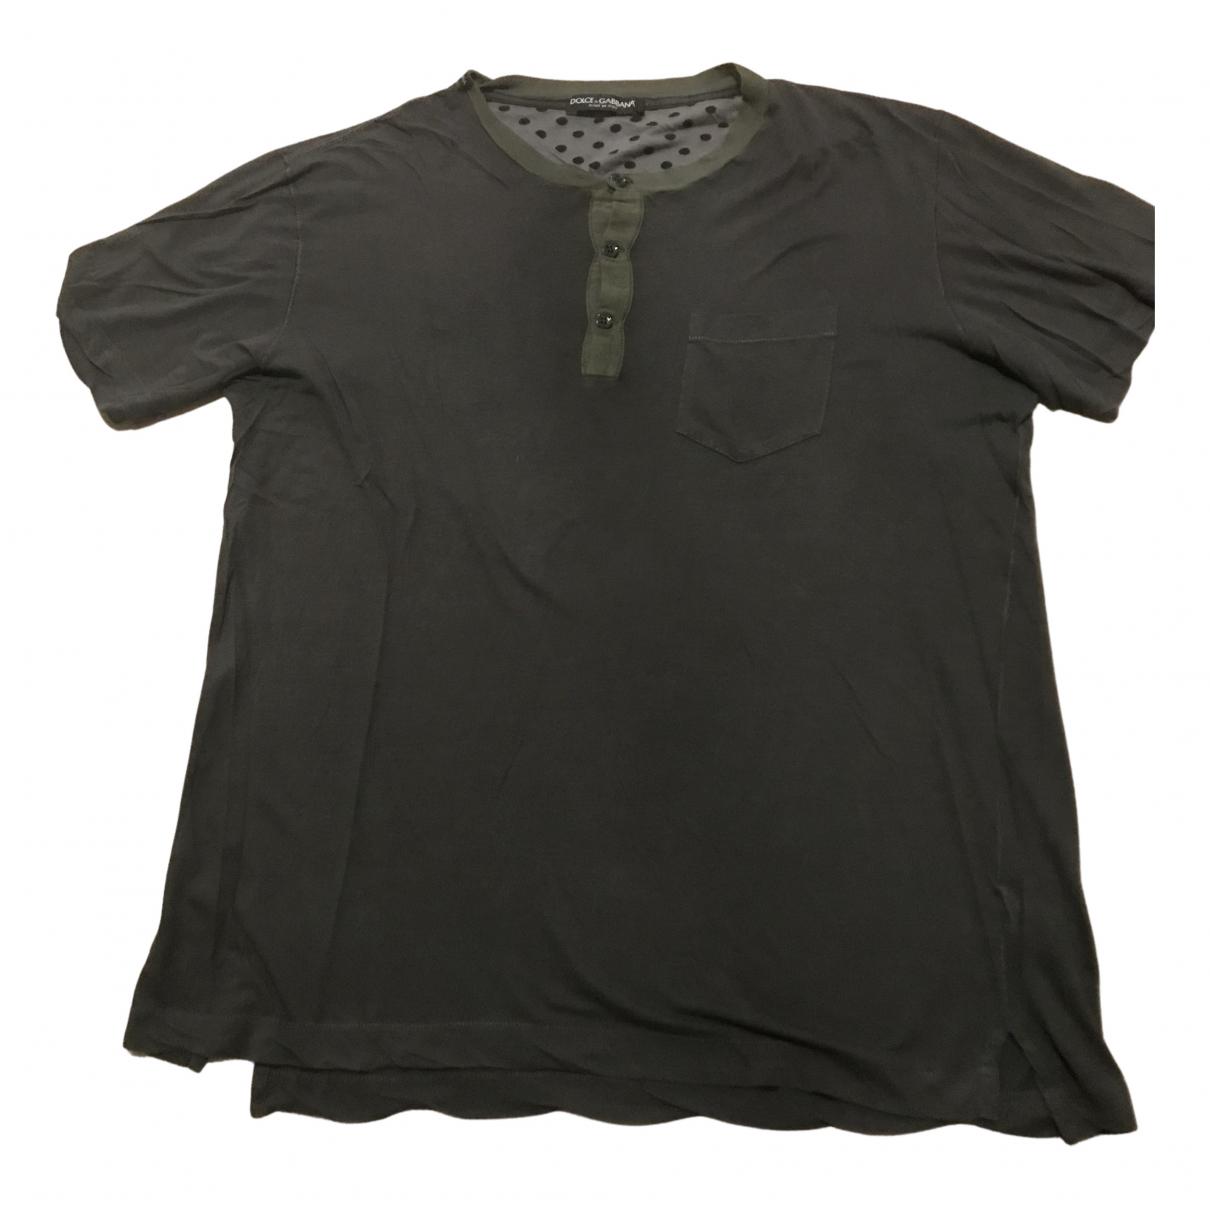 Dolce & Gabbana - Tee shirts   pour homme en coton - vert